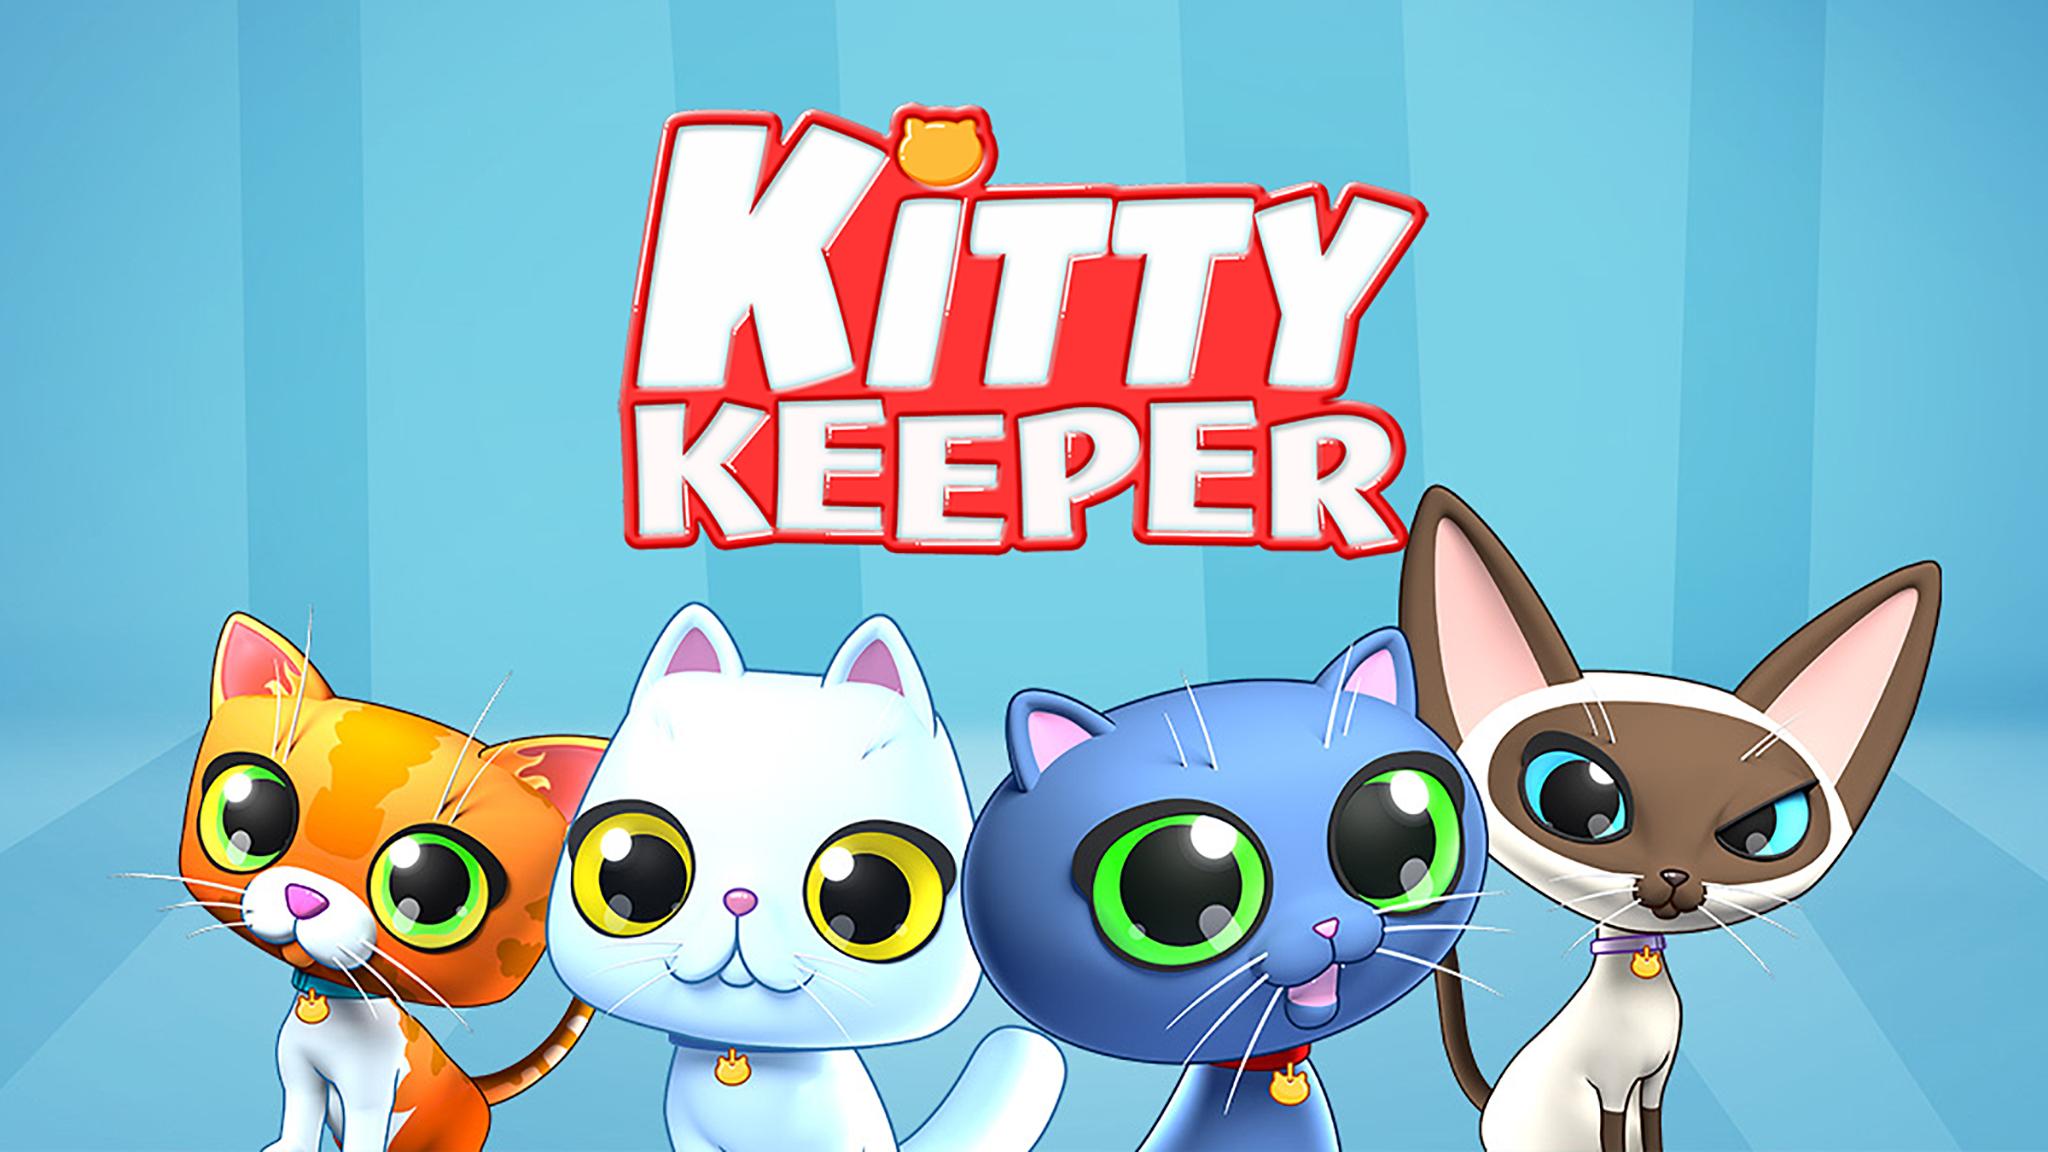 Kitty Keeper